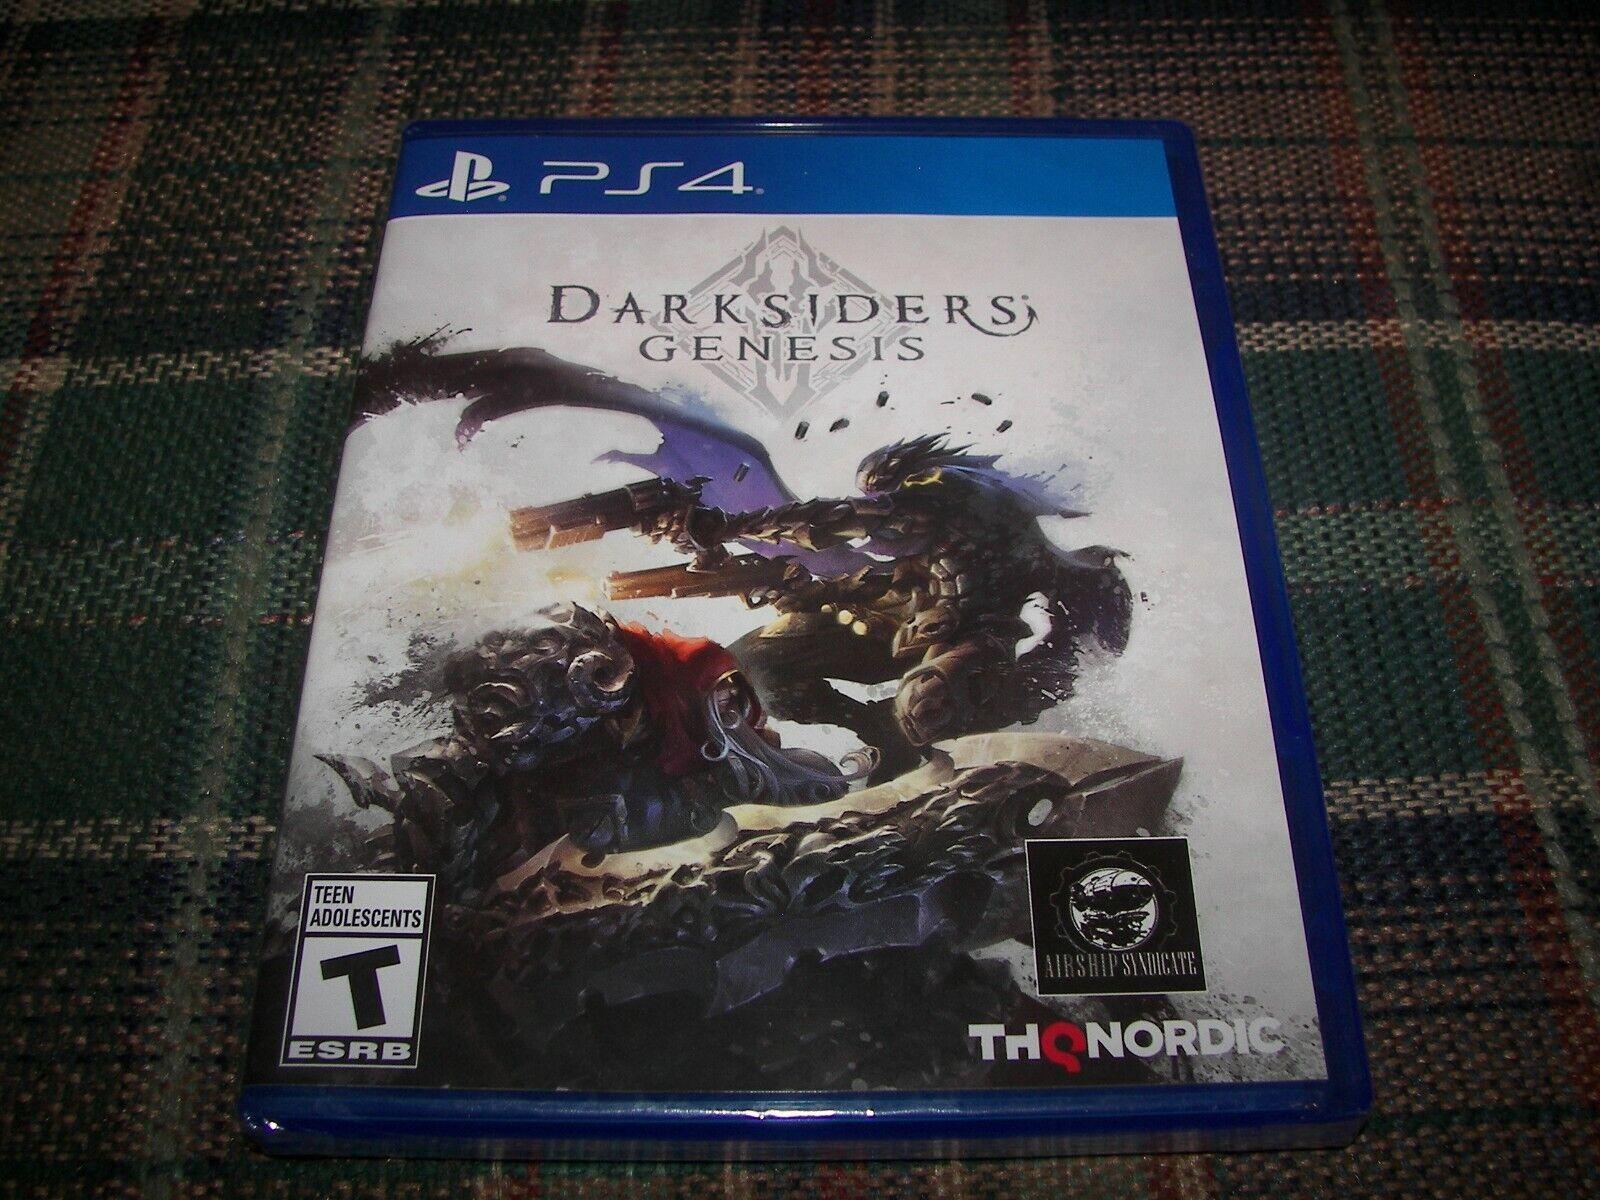 Darksiders Genesis Sony PlayStation 4 PS4 Game BRAND NEW  - $16.00